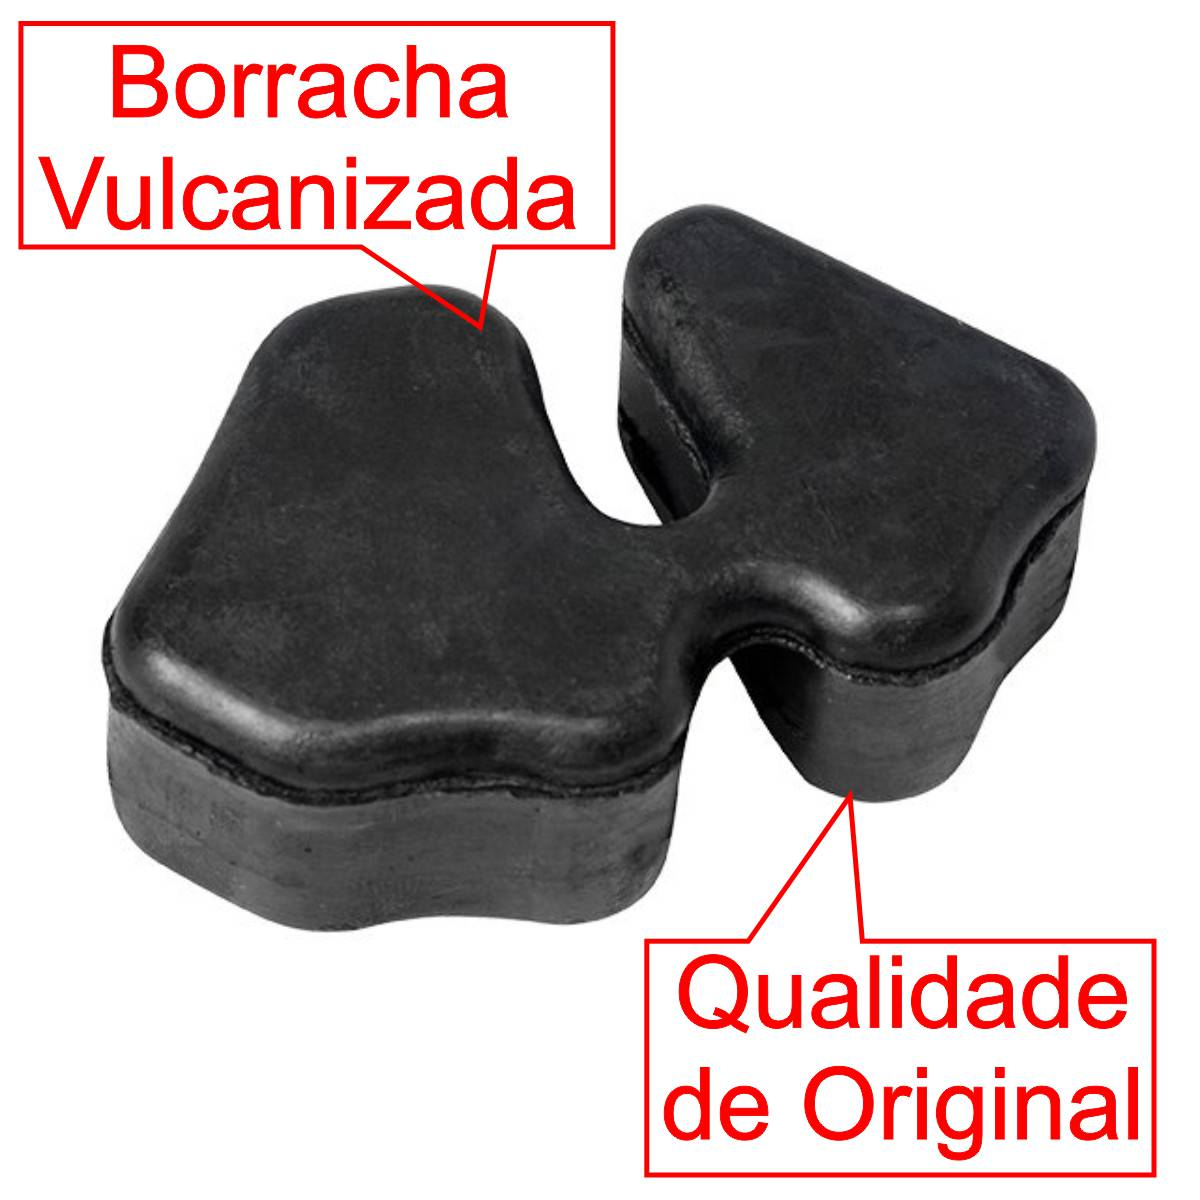 KIT COXIM BORRACHA BUCHA DA COROA RODA CBX 250 TWISTER CB 250 CB 300 JOGO 4 PEÇAS + GRAXA SPRAY 60ml